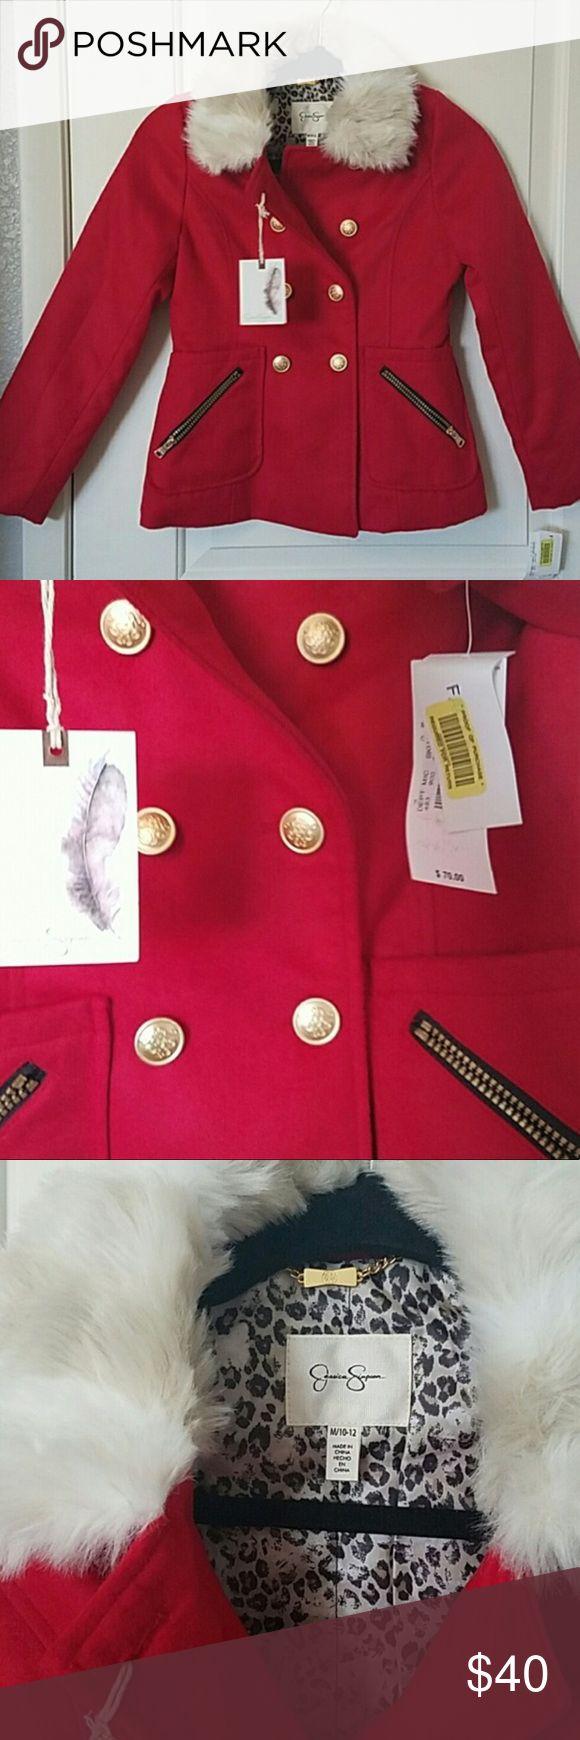 Jessica Simpson Coat Girls Jessica Simpson Coat ~ NWT ~ never worn! Jessica Simpson Jackets & Coats